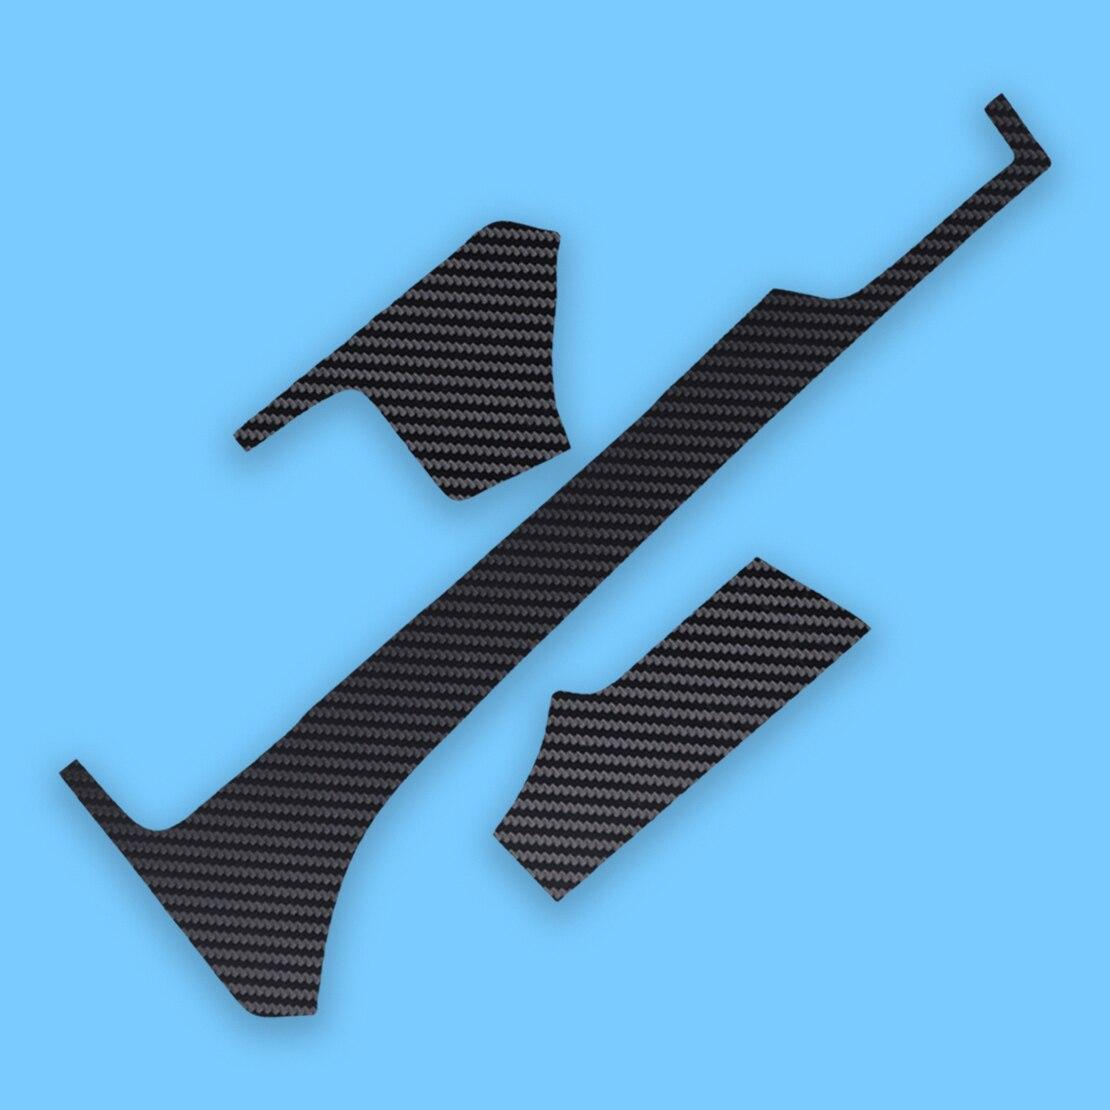 CITALL 3pcs/set PP Black Carbon Fiber Style Dashboard Air Vent Outlet Decoration Cover Trim Sticker Fit For Tesla Model X S